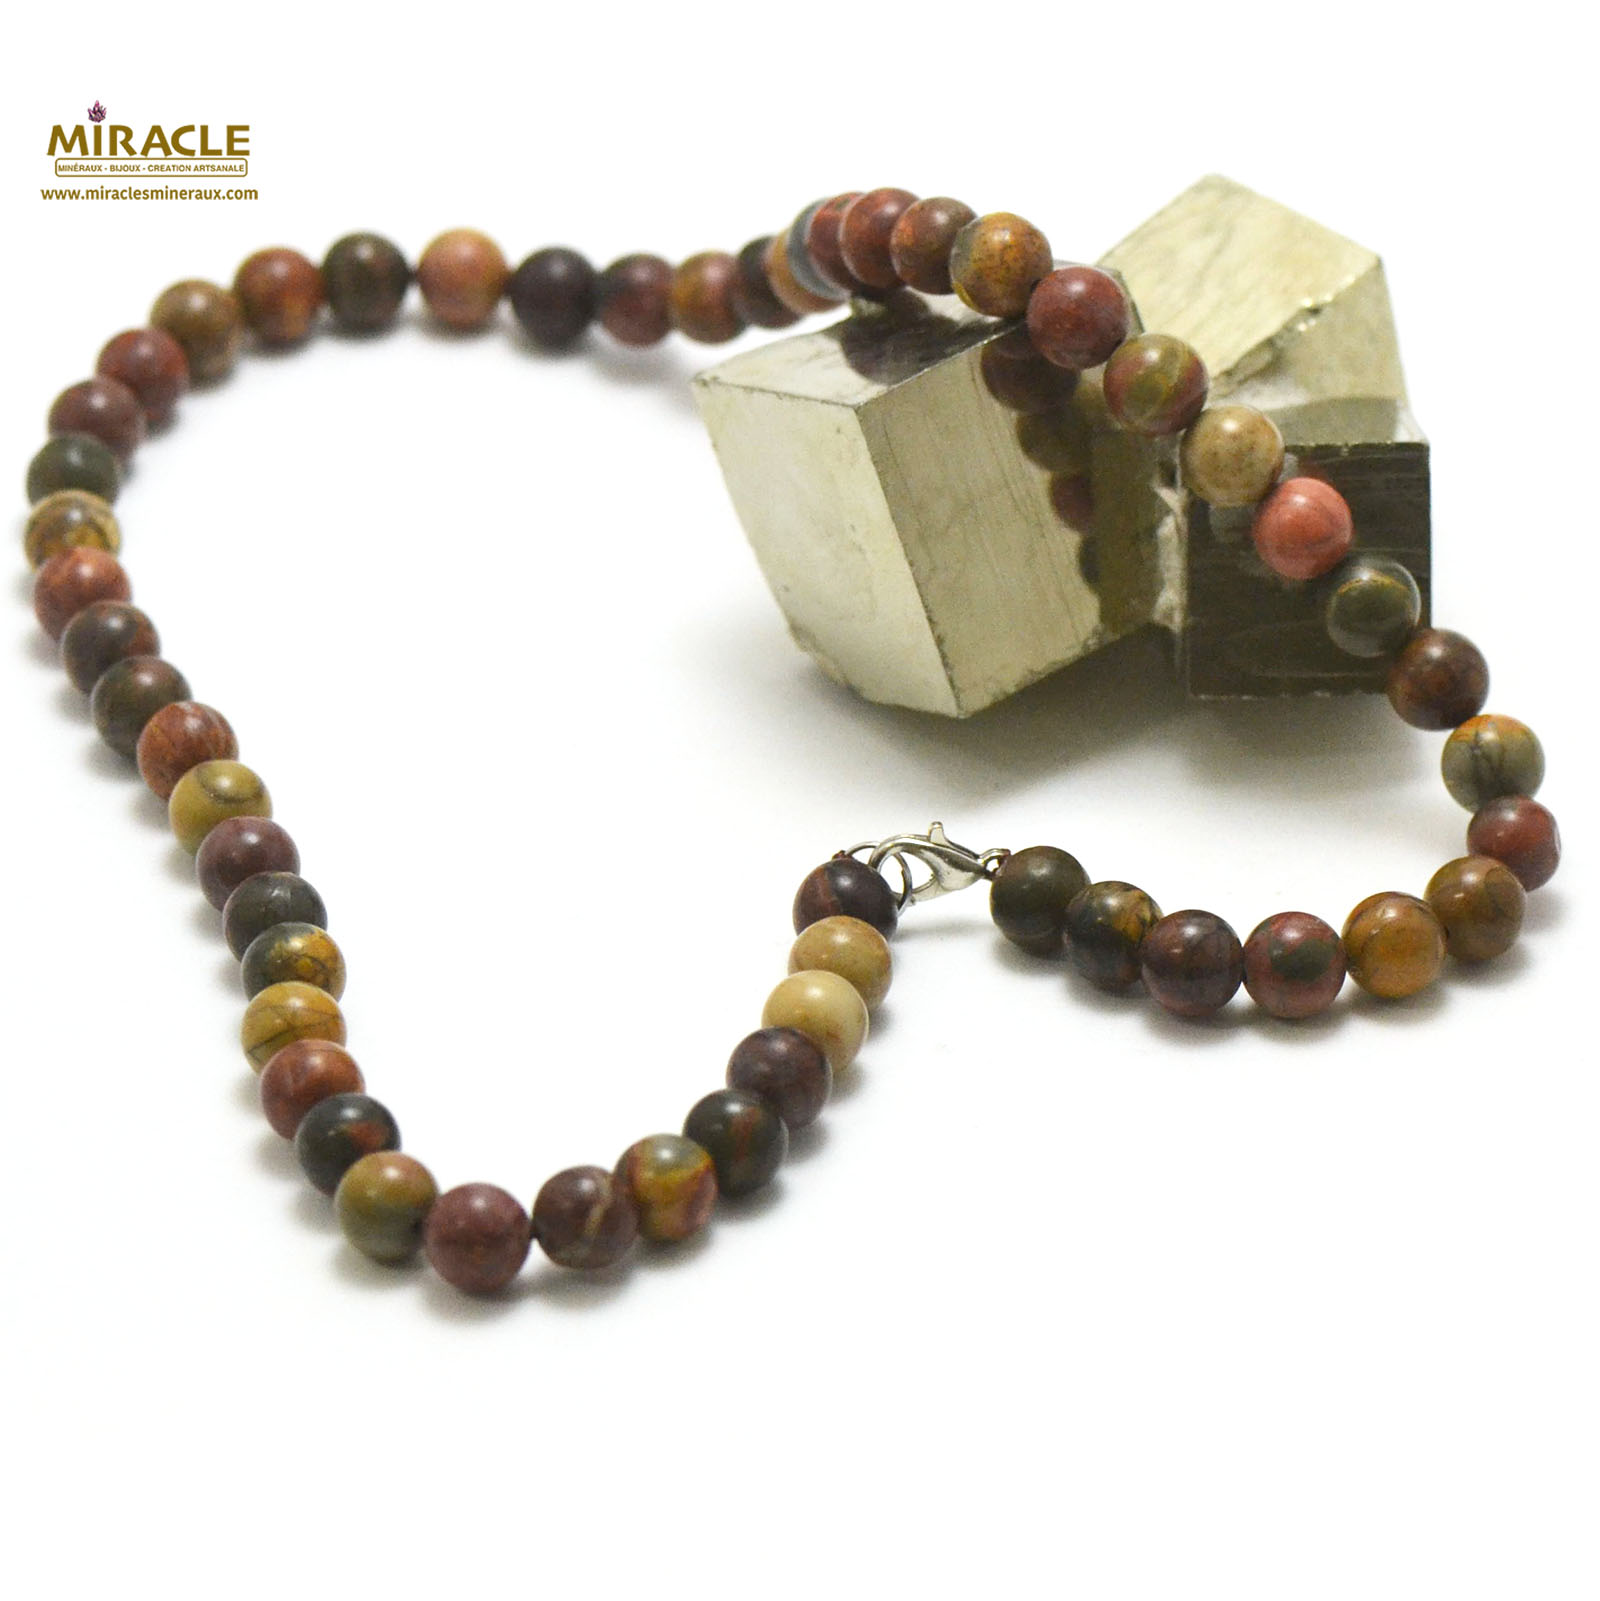 collier en jaspe picasso, perle ronde 8 mm